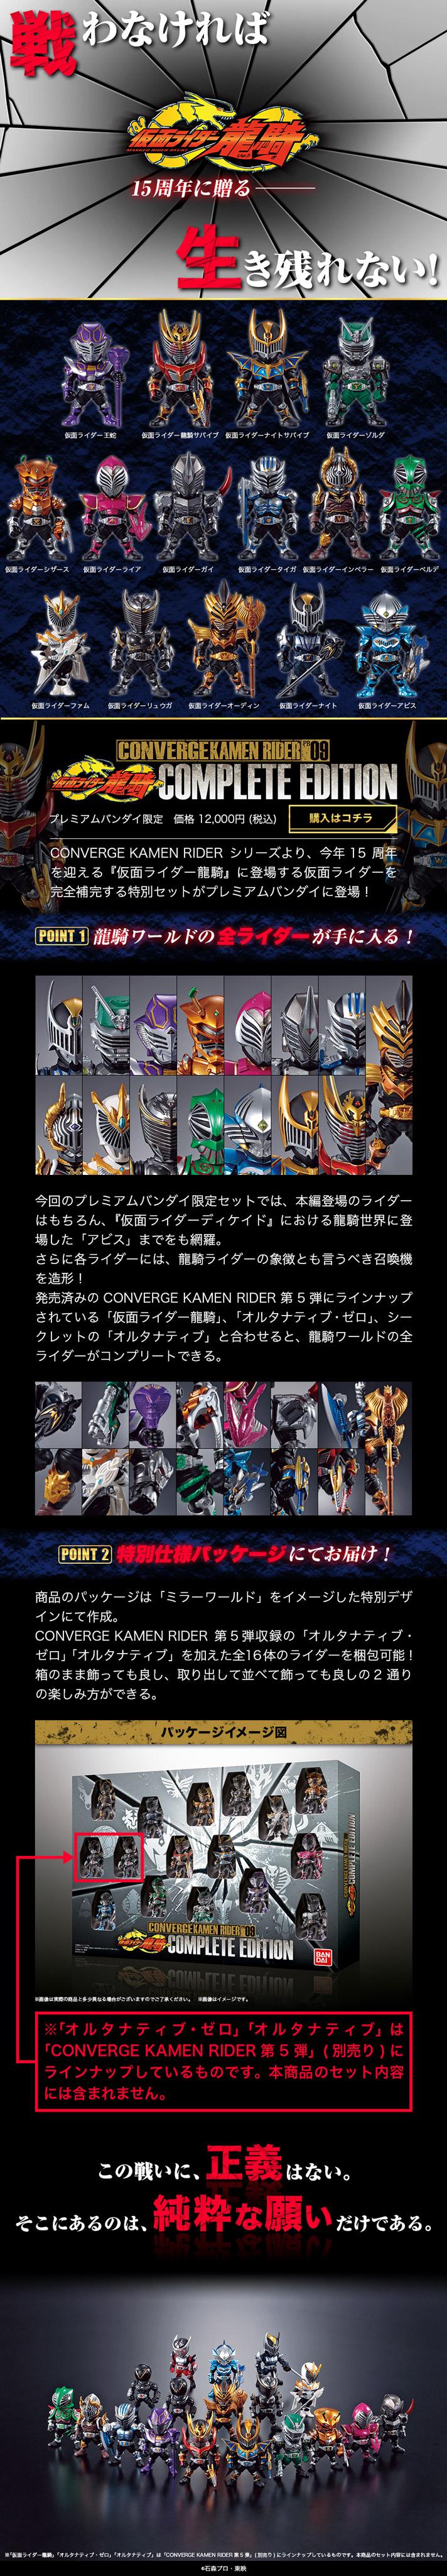 CONVERGE KAMEN RIDER PB09 仮面ライダー龍騎コンプリートセット 【プレミアムバンダイ限定】